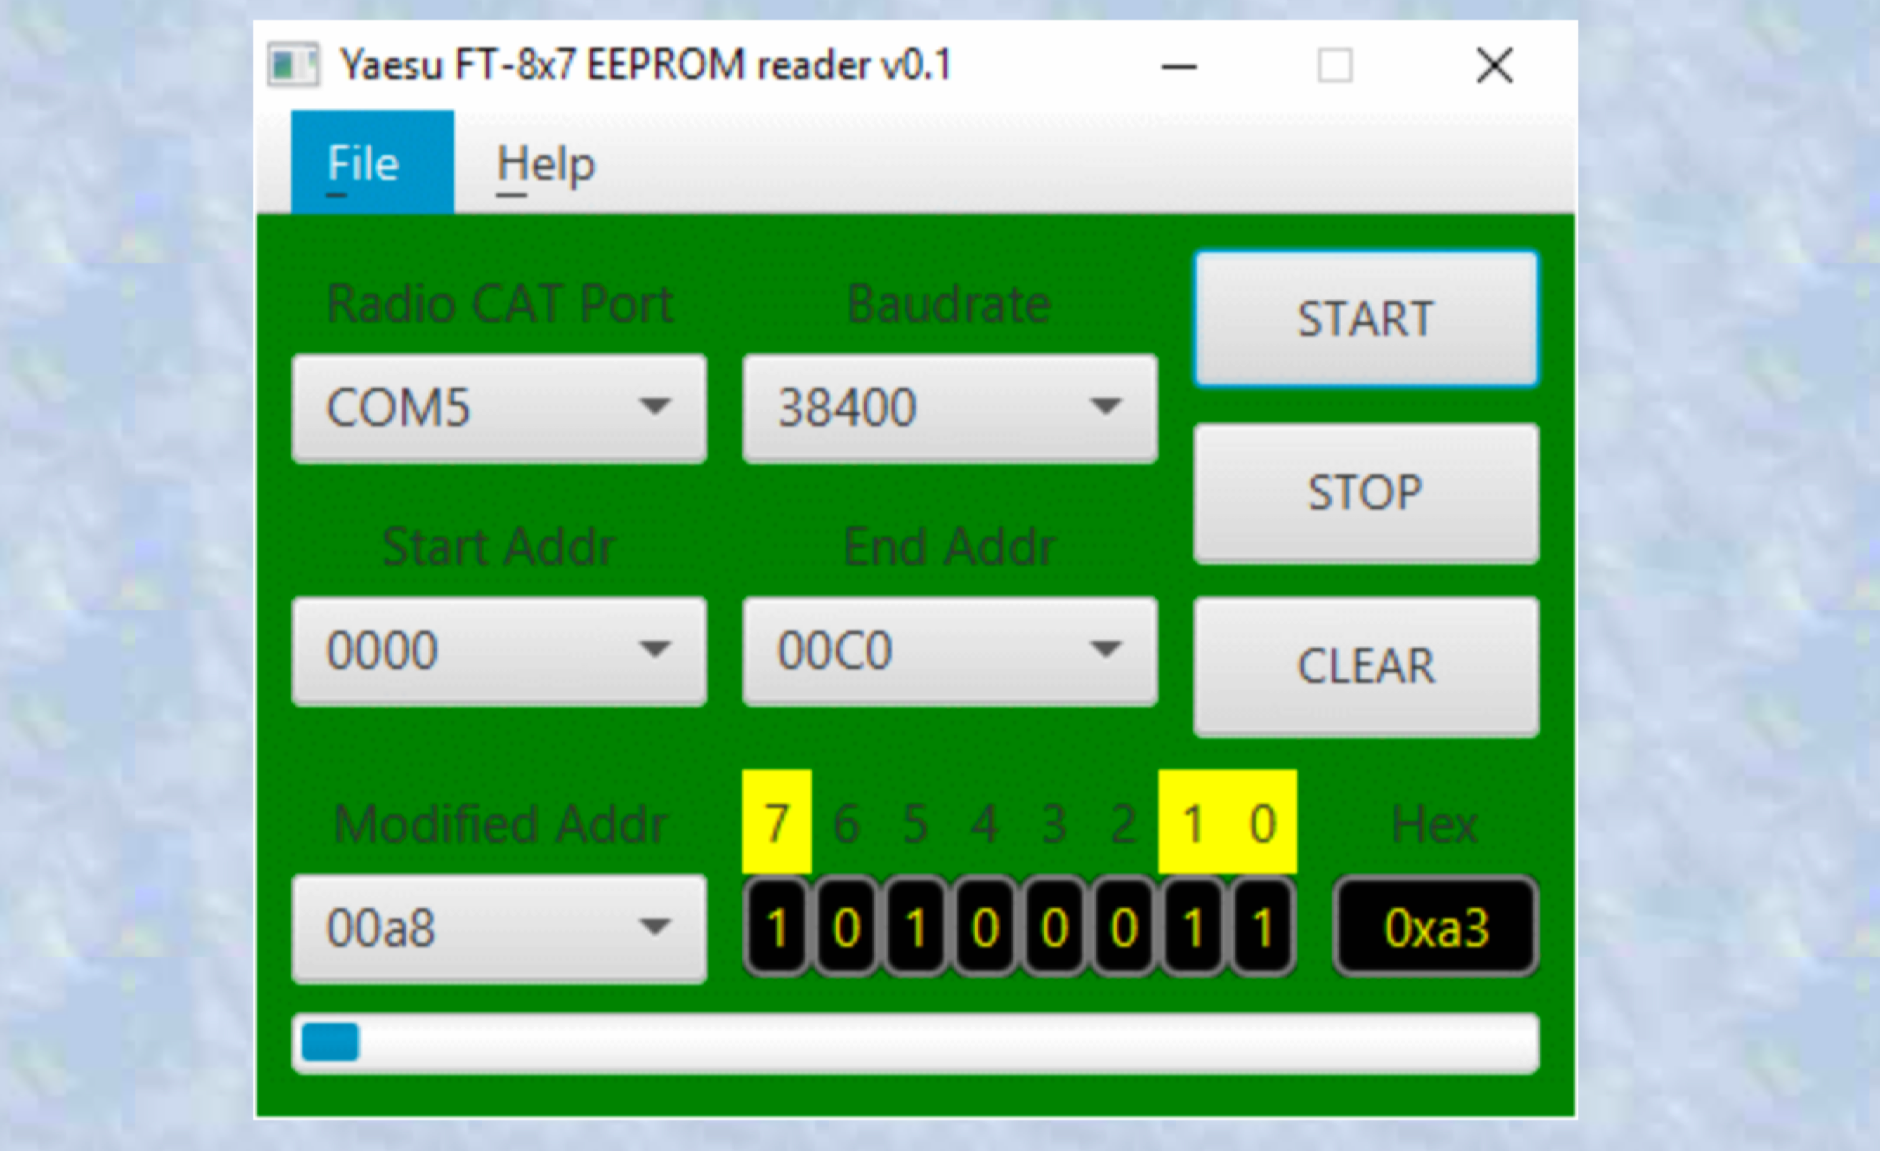 DXZone Yaesu FT-817 FT-857 FT-897 EEPROM analyzer